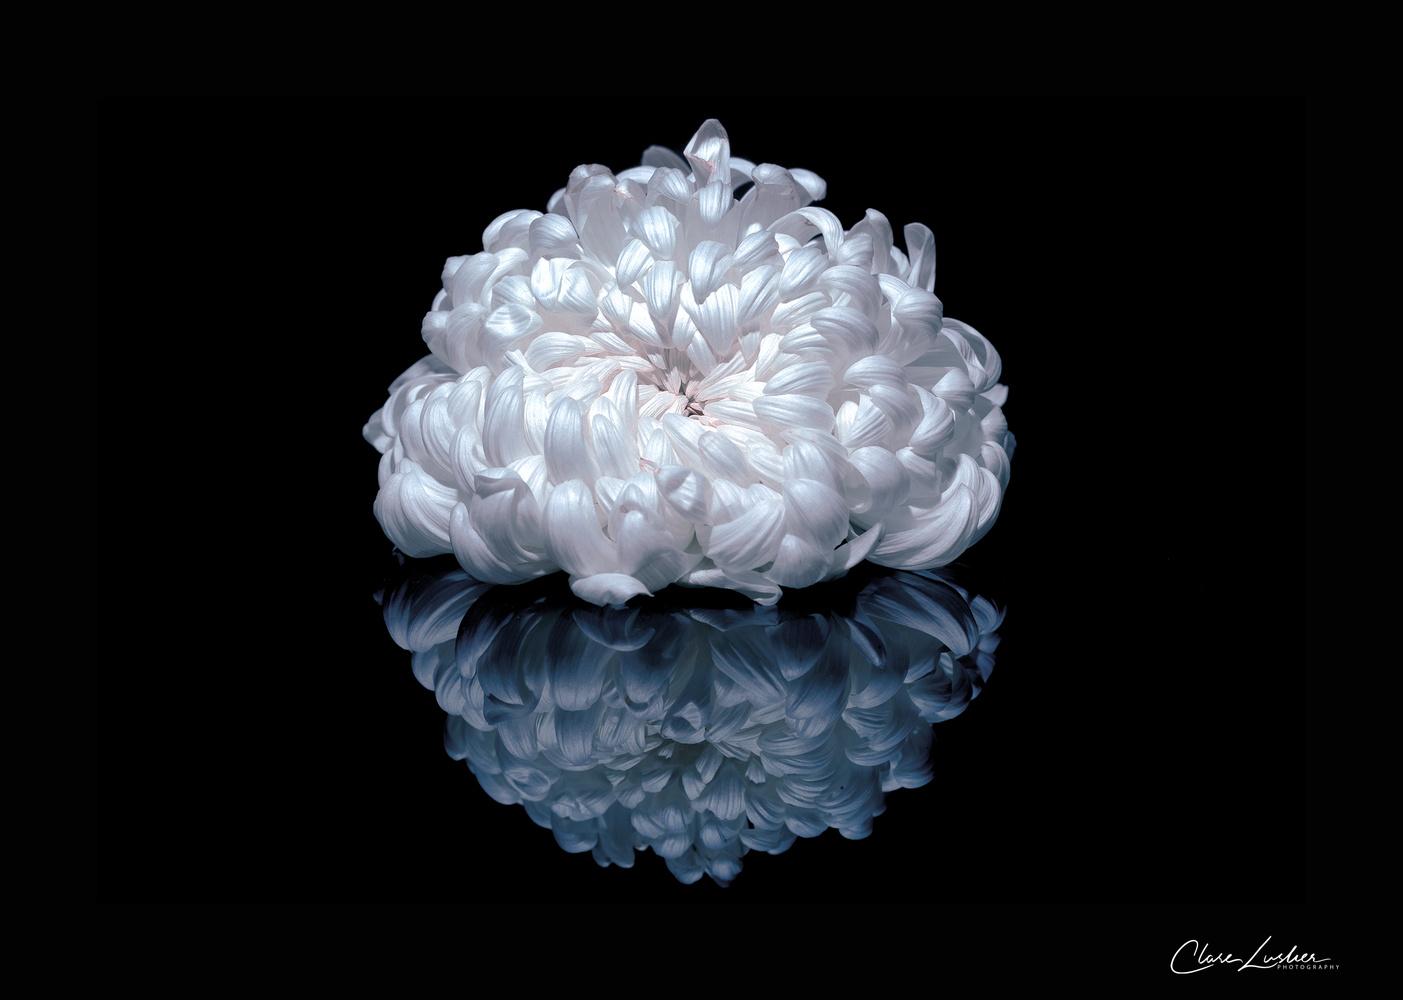 Chrysanthemum by Clare Lusher